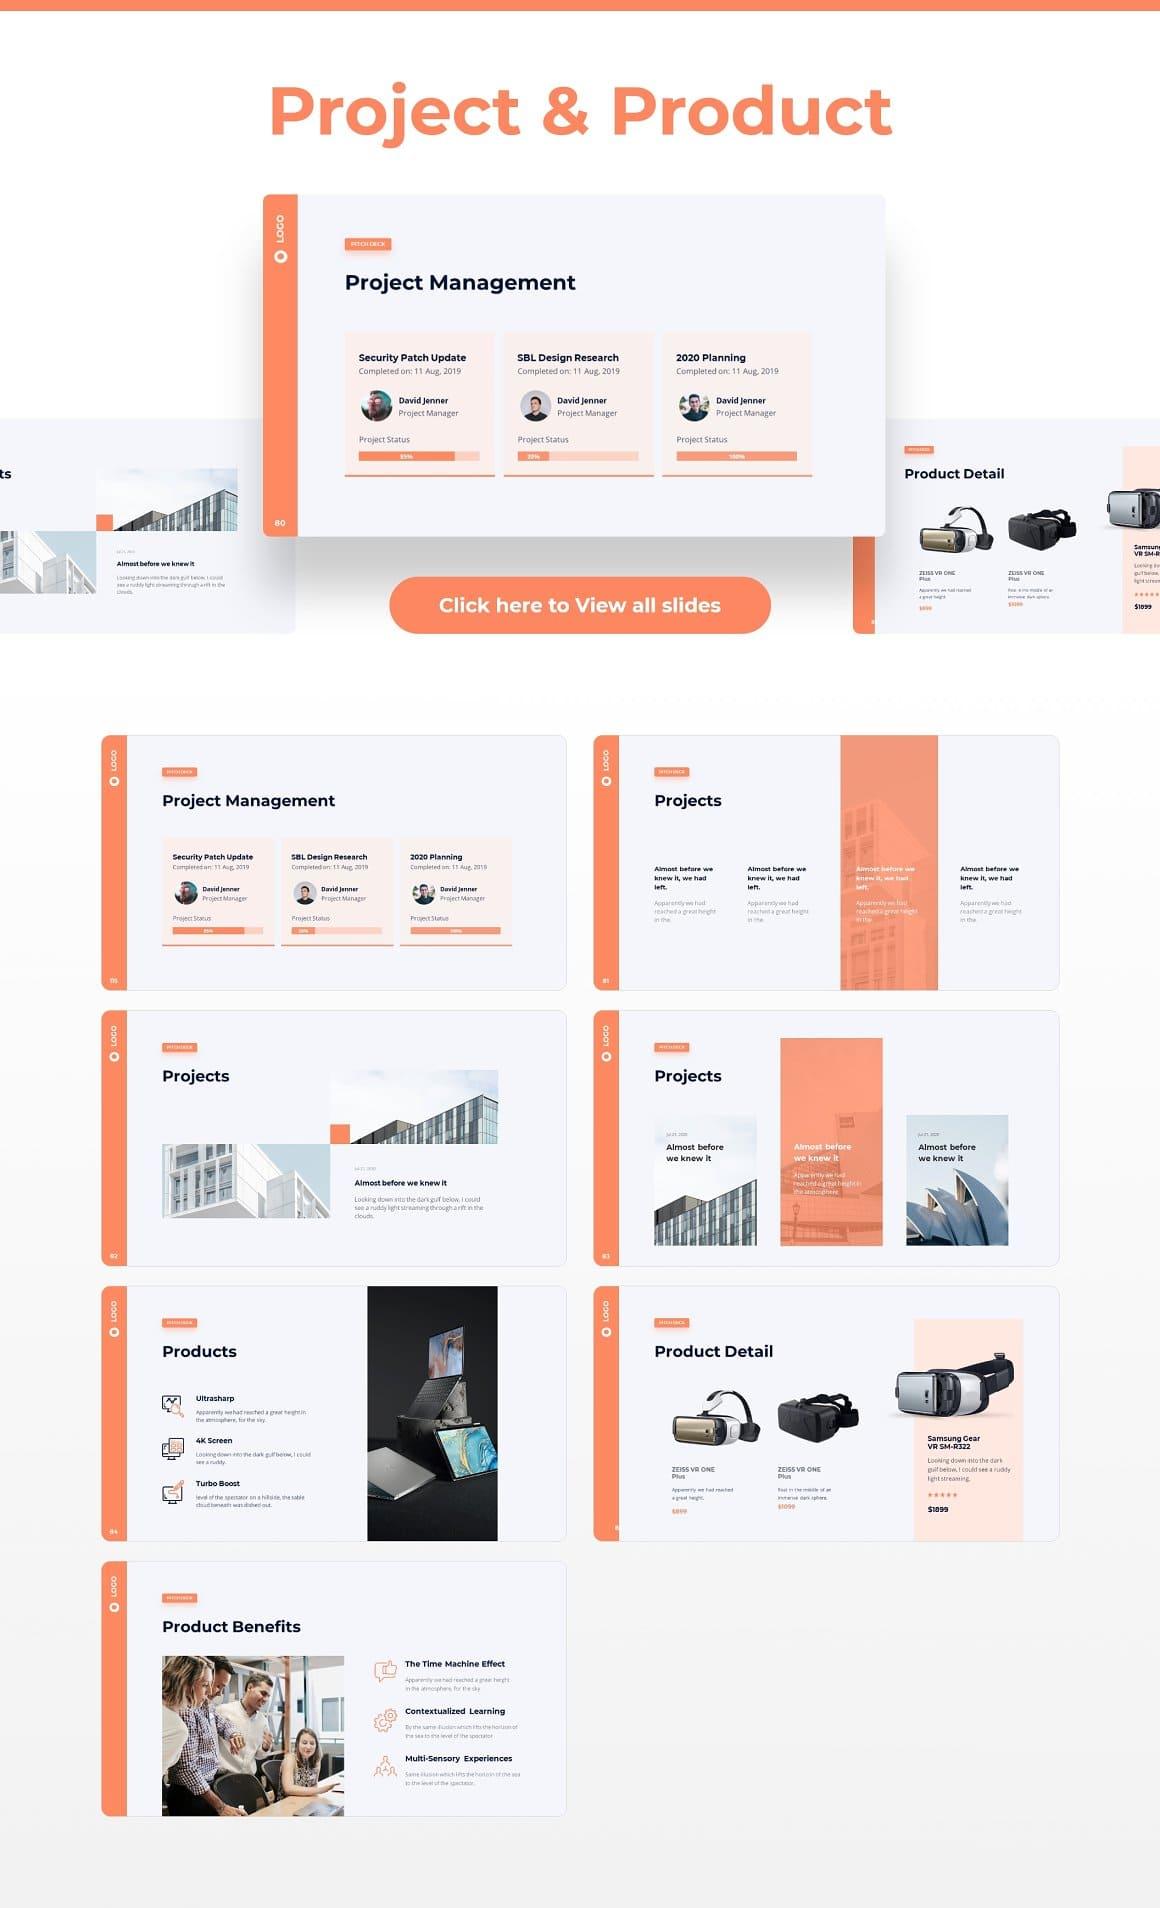 Slides Project & Product Light Theme Pitch Deck & Presentation V3.0.